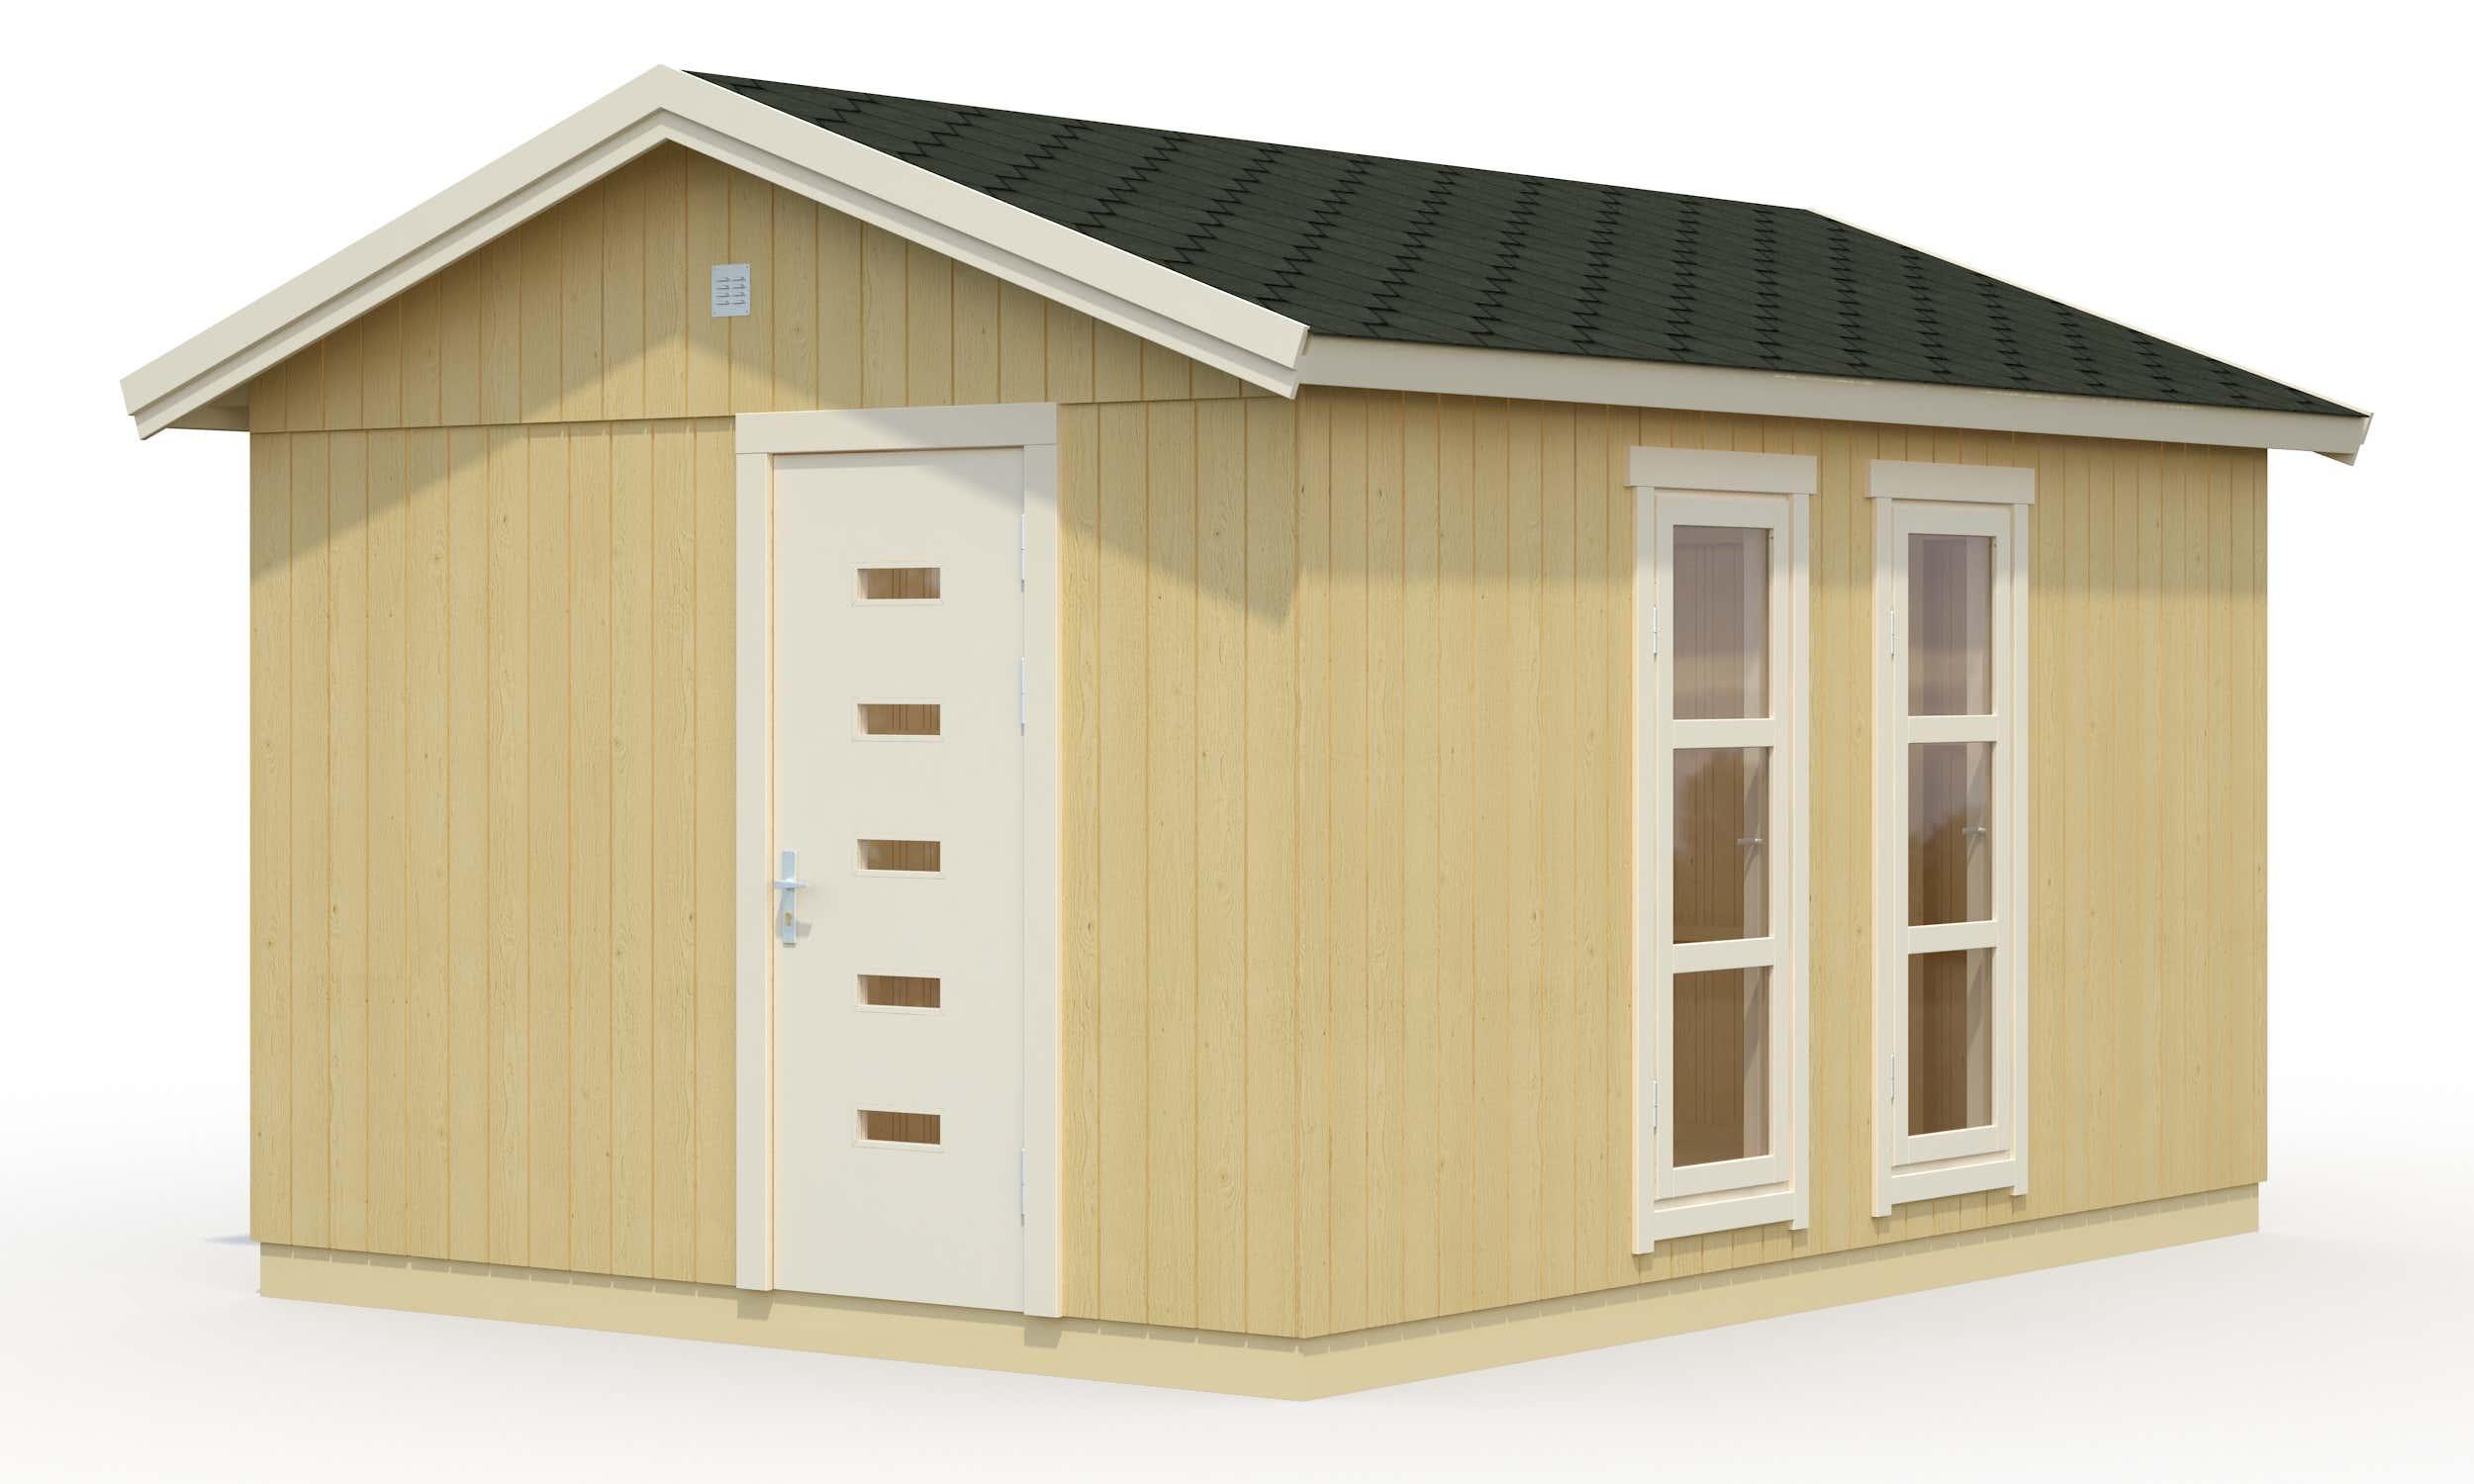 palmako nordic gartenhaus ly 13 8 m eld18 3345 a z. Black Bedroom Furniture Sets. Home Design Ideas